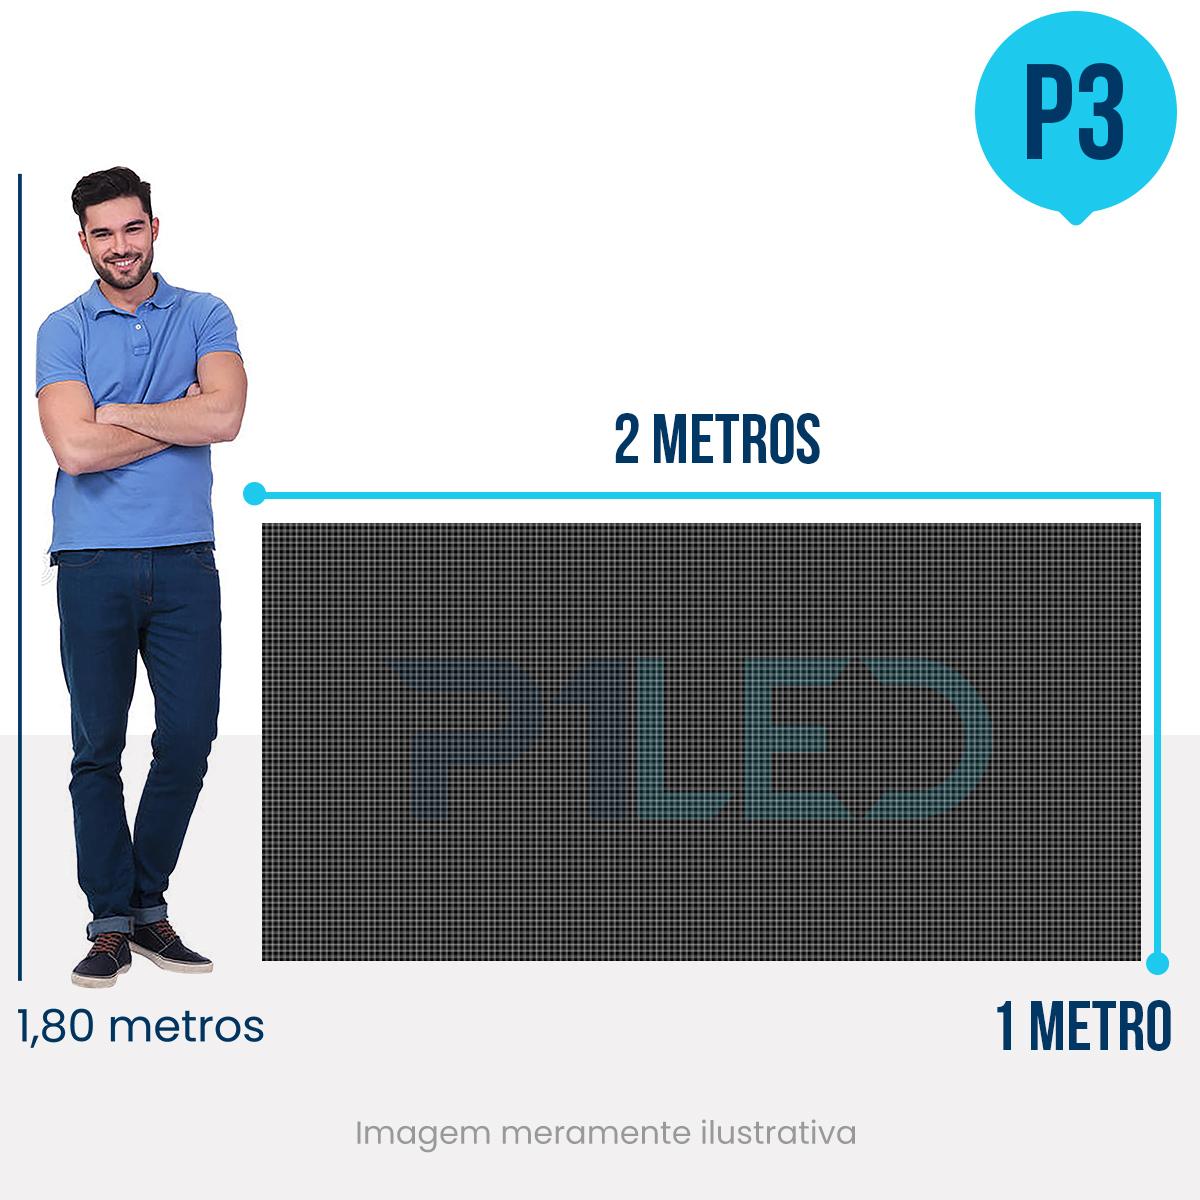 Painel de LED para Padaria 2x1 - Telão P3 Indoor  - Painel e Telão de LED - O Melhor Preço em Painel de LED   P1LED